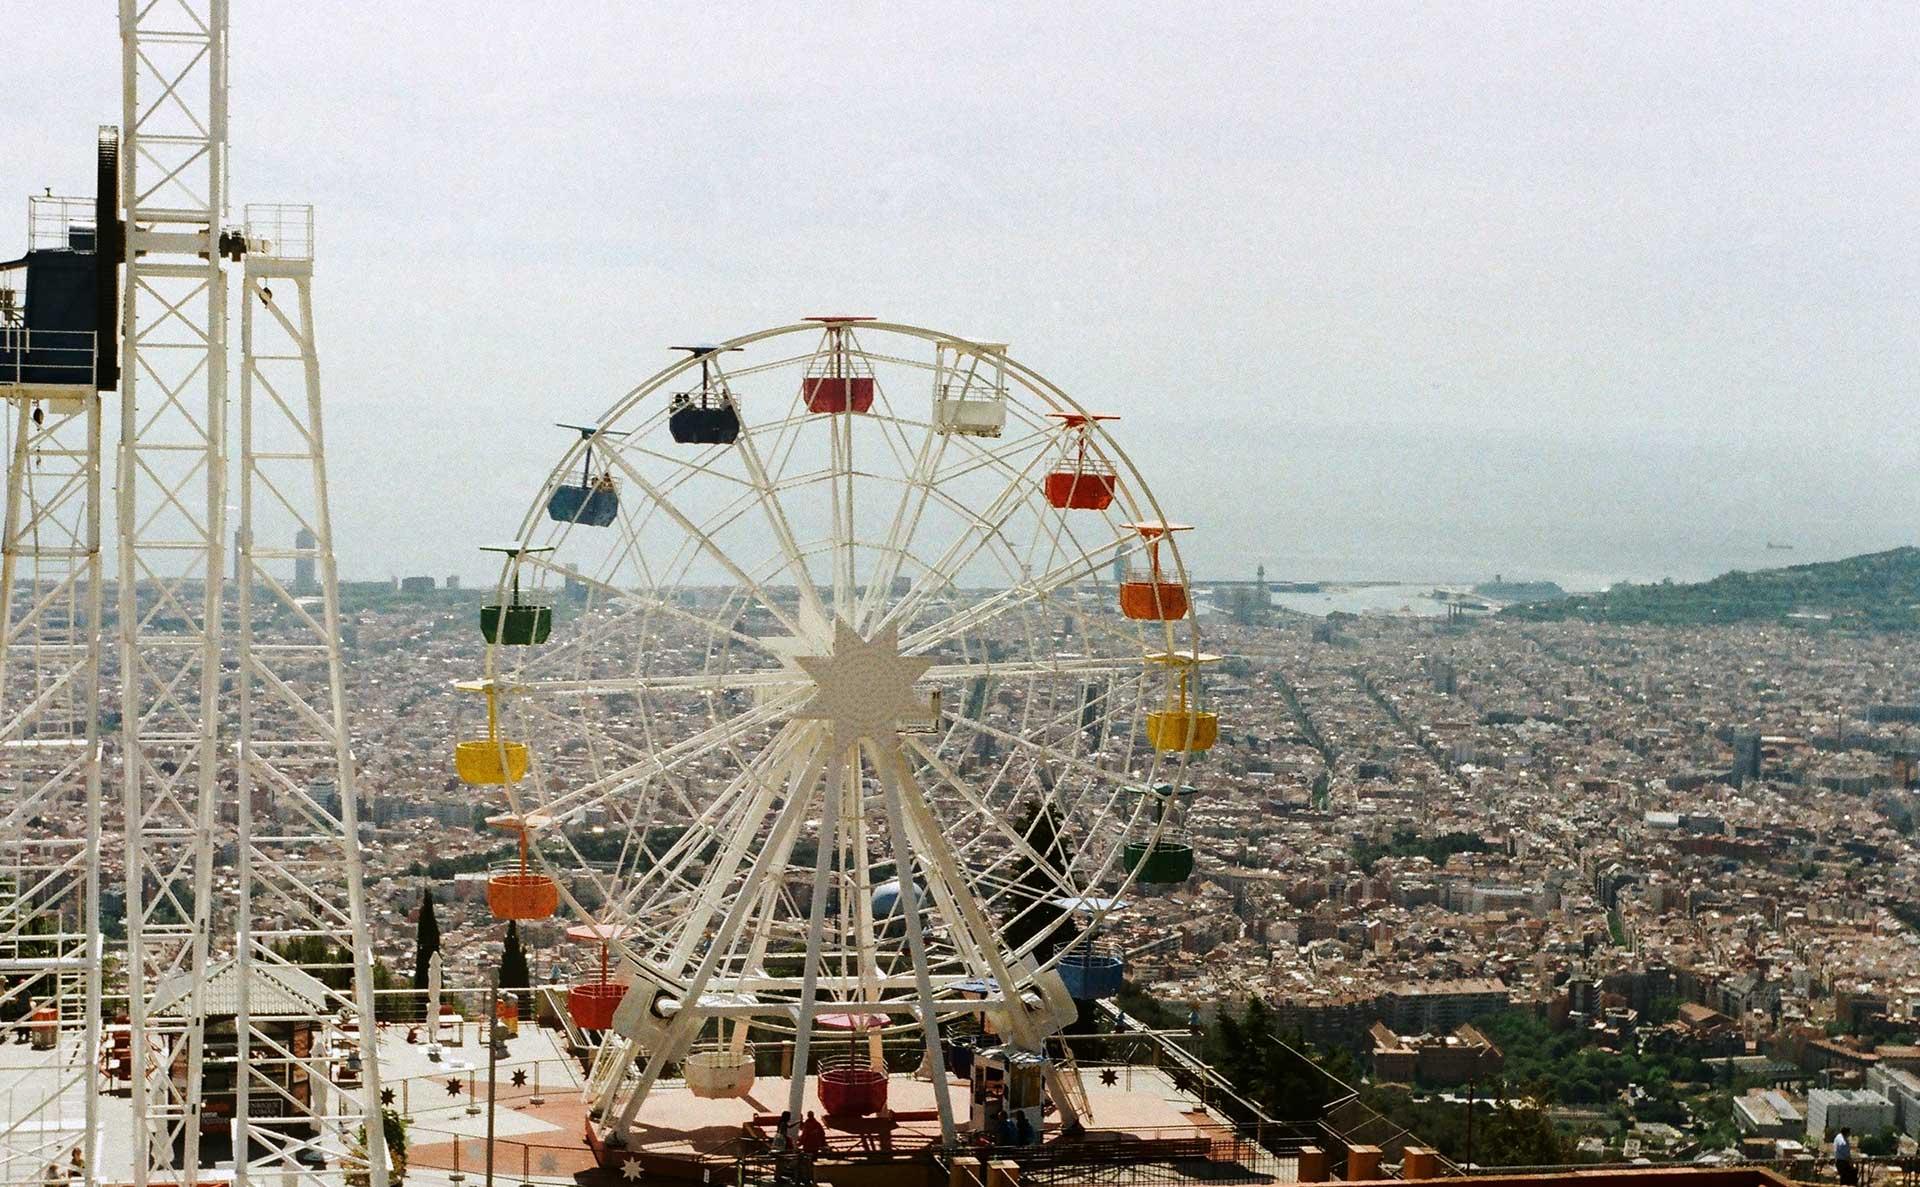 Aztlán parque